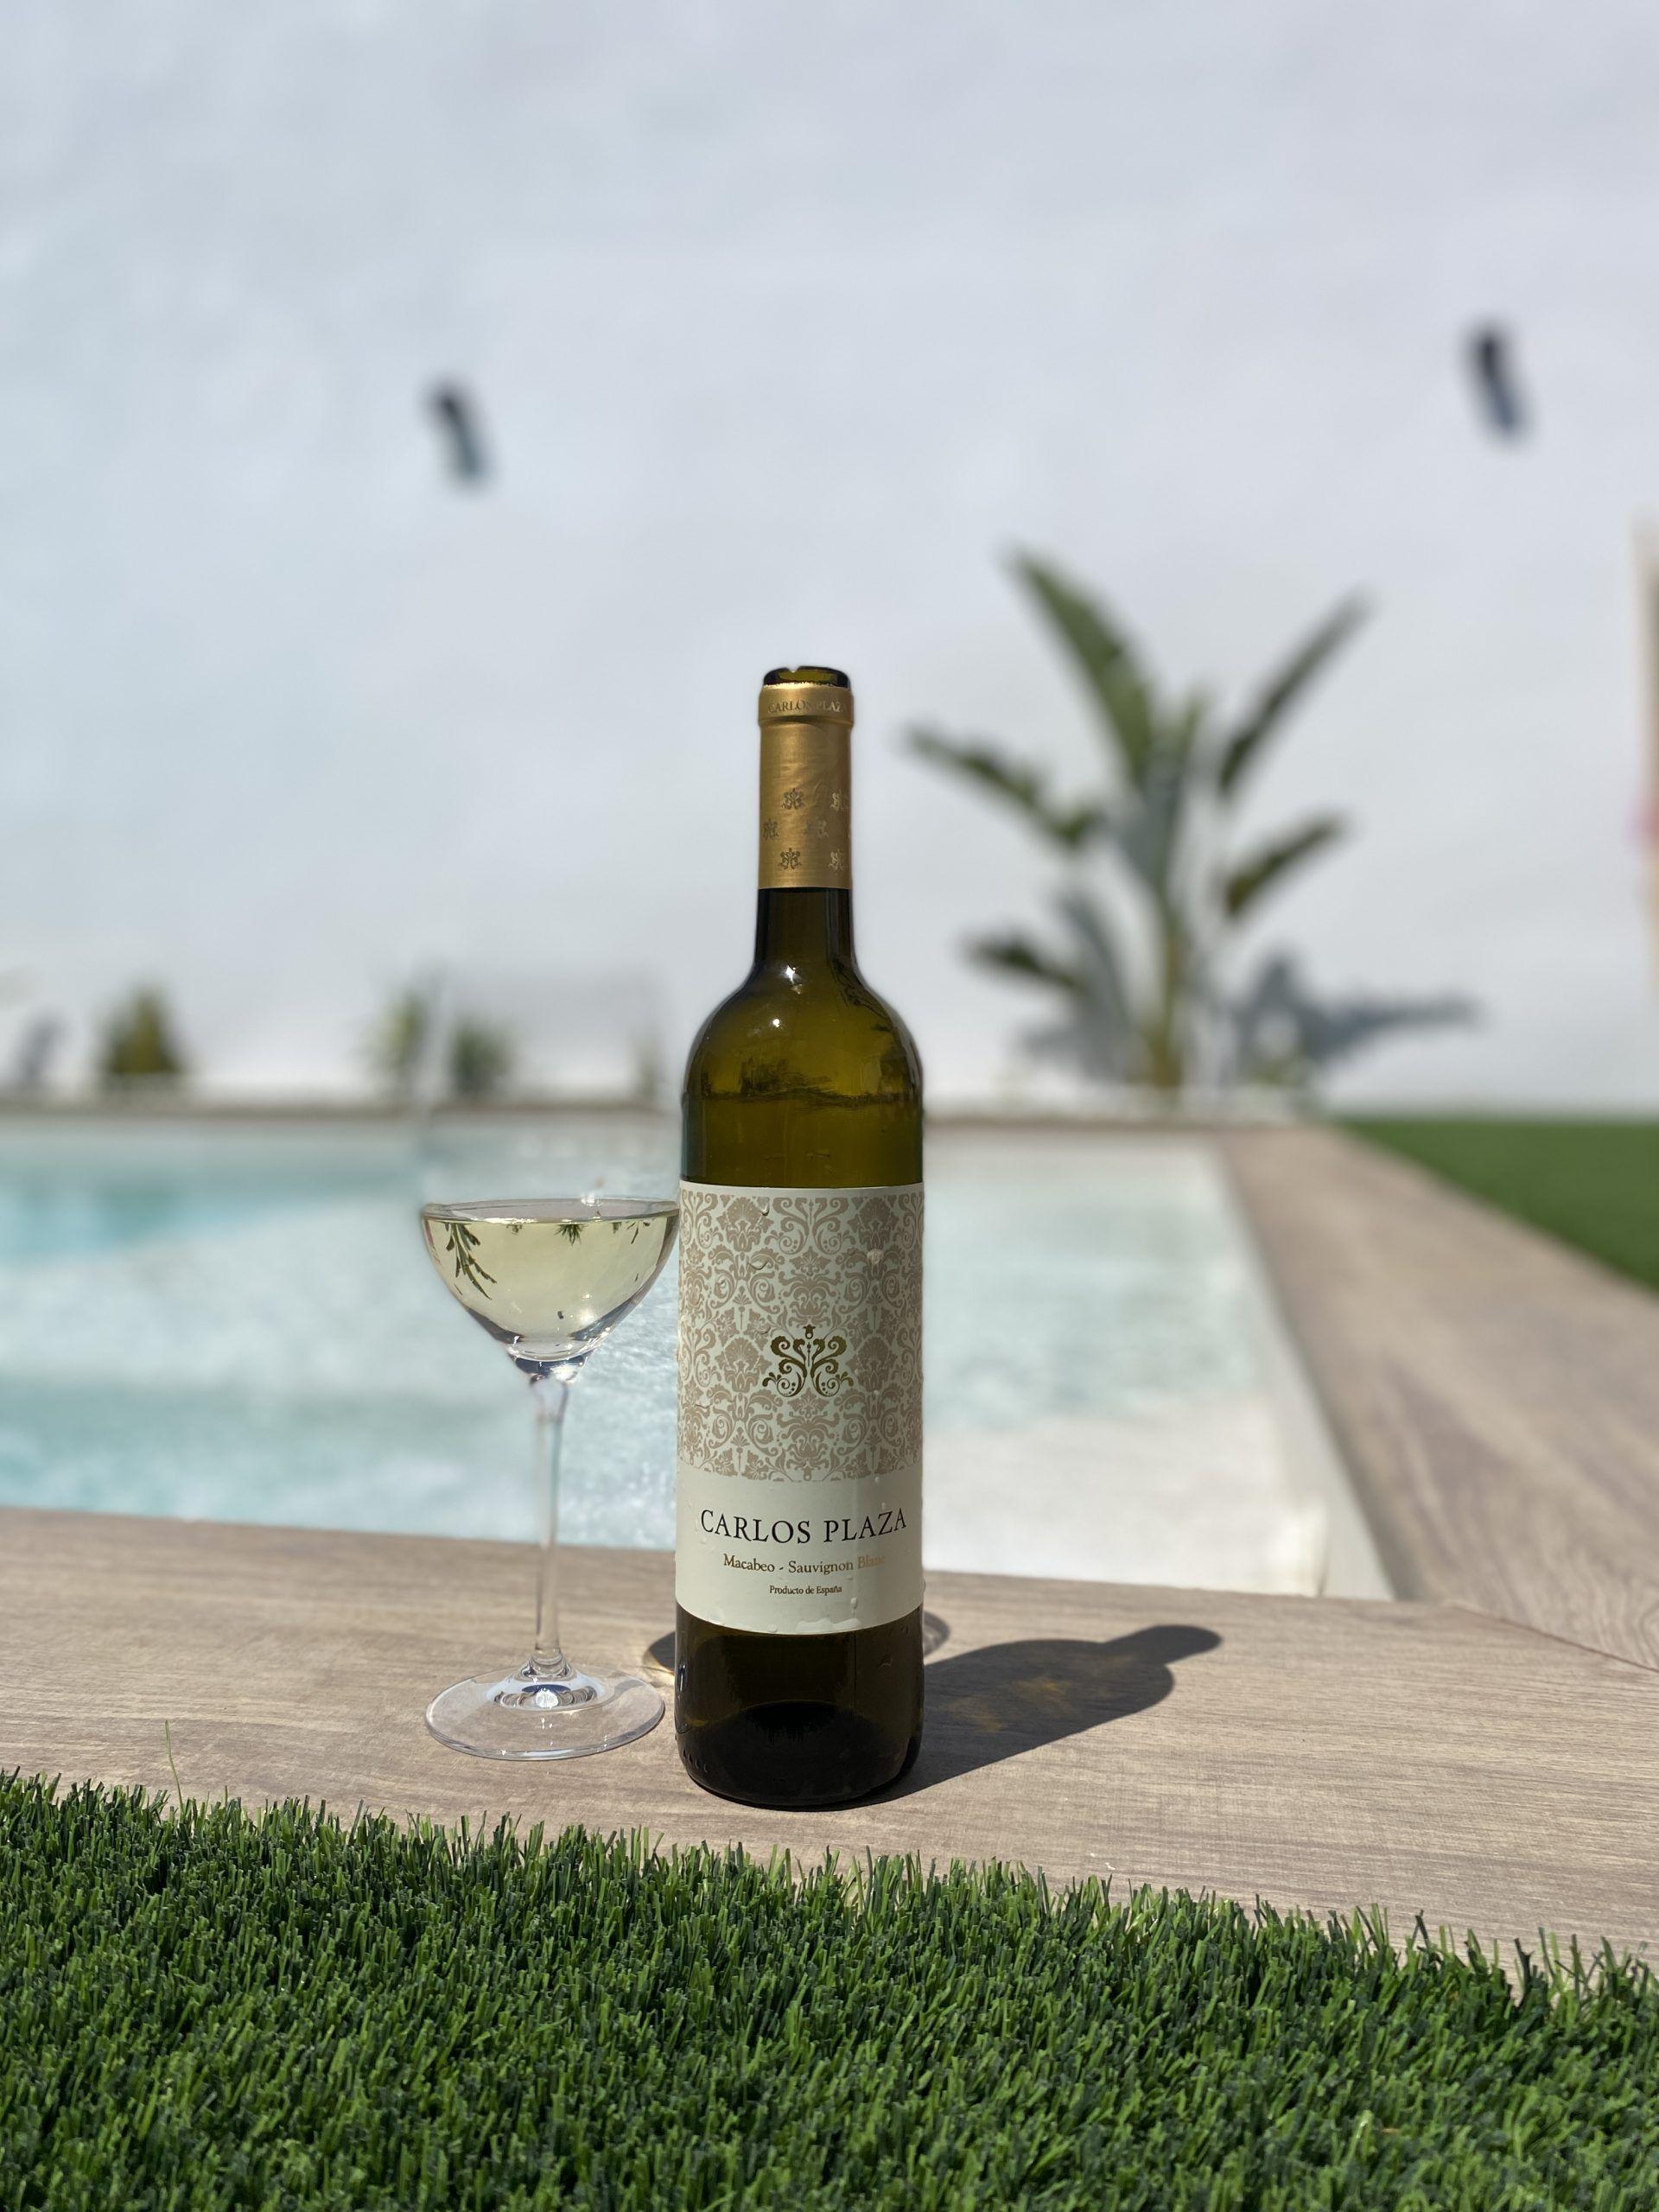 dry wine wine Spanish wine Carlos Plaza wine from Spain